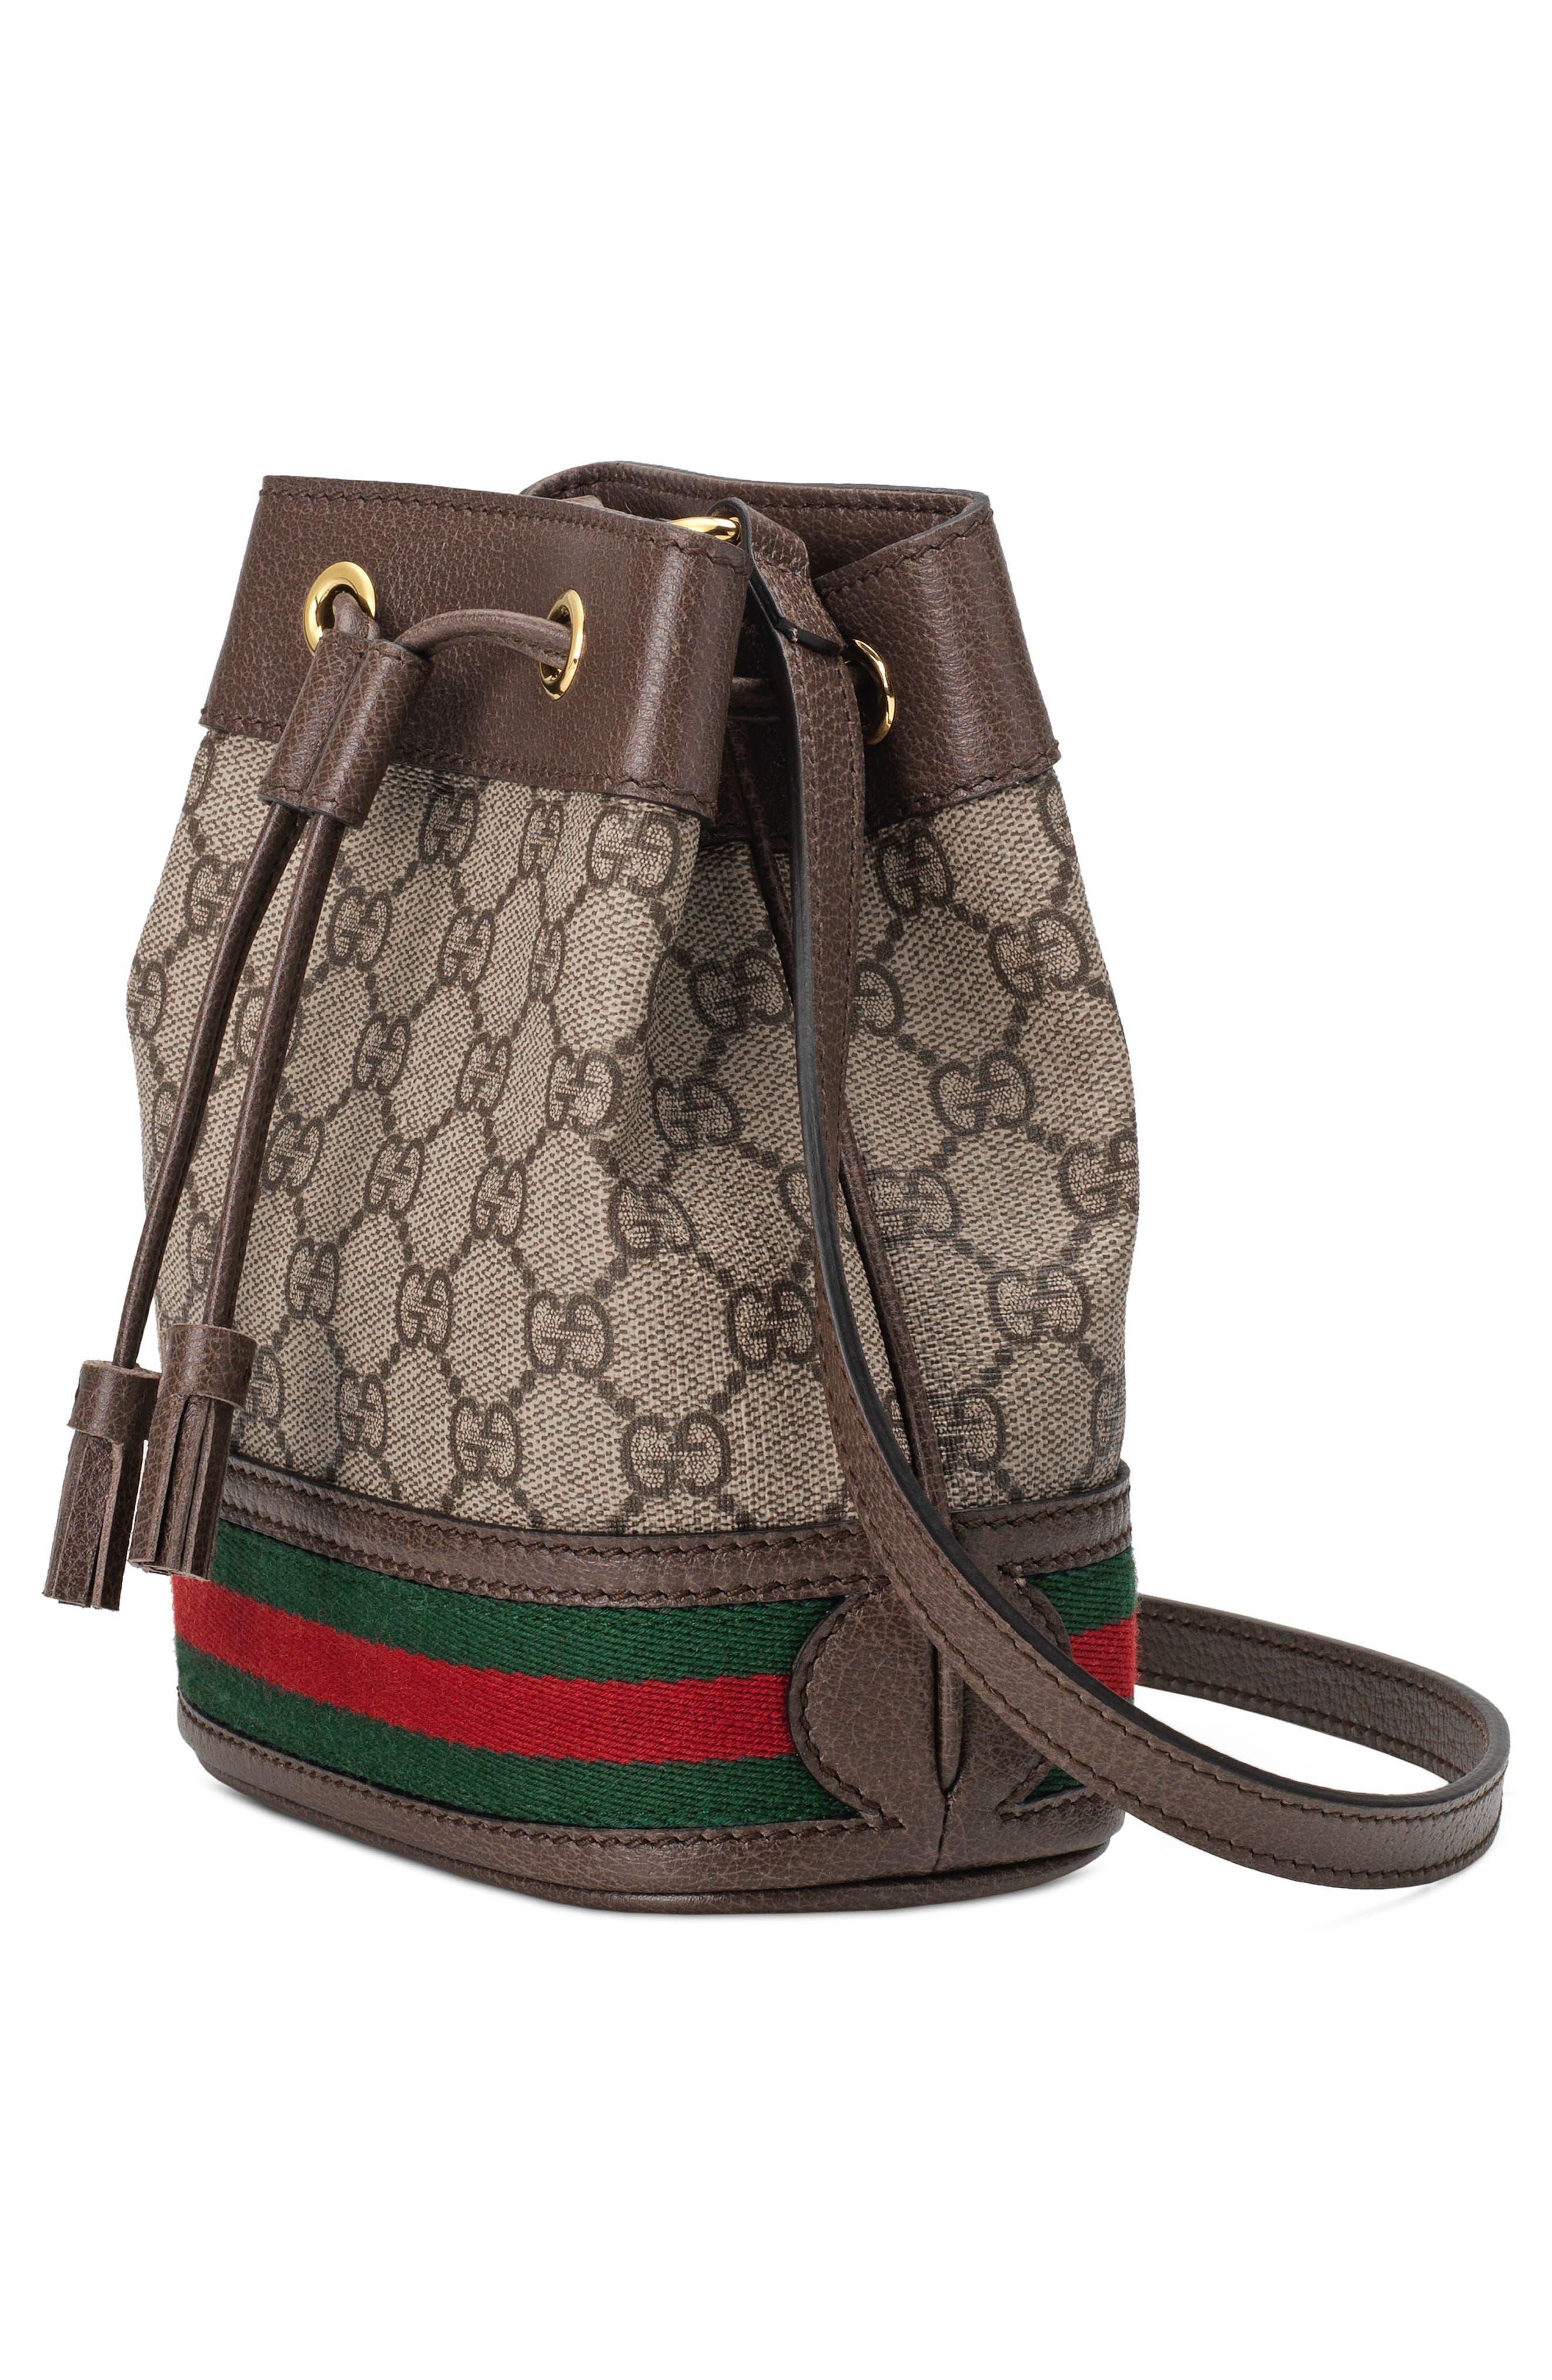 Mini Ophidia GG Supreme Bucket Bag,                             Alternate thumbnail 4, color,                             BEIGE EBONY/ NEW ACERO